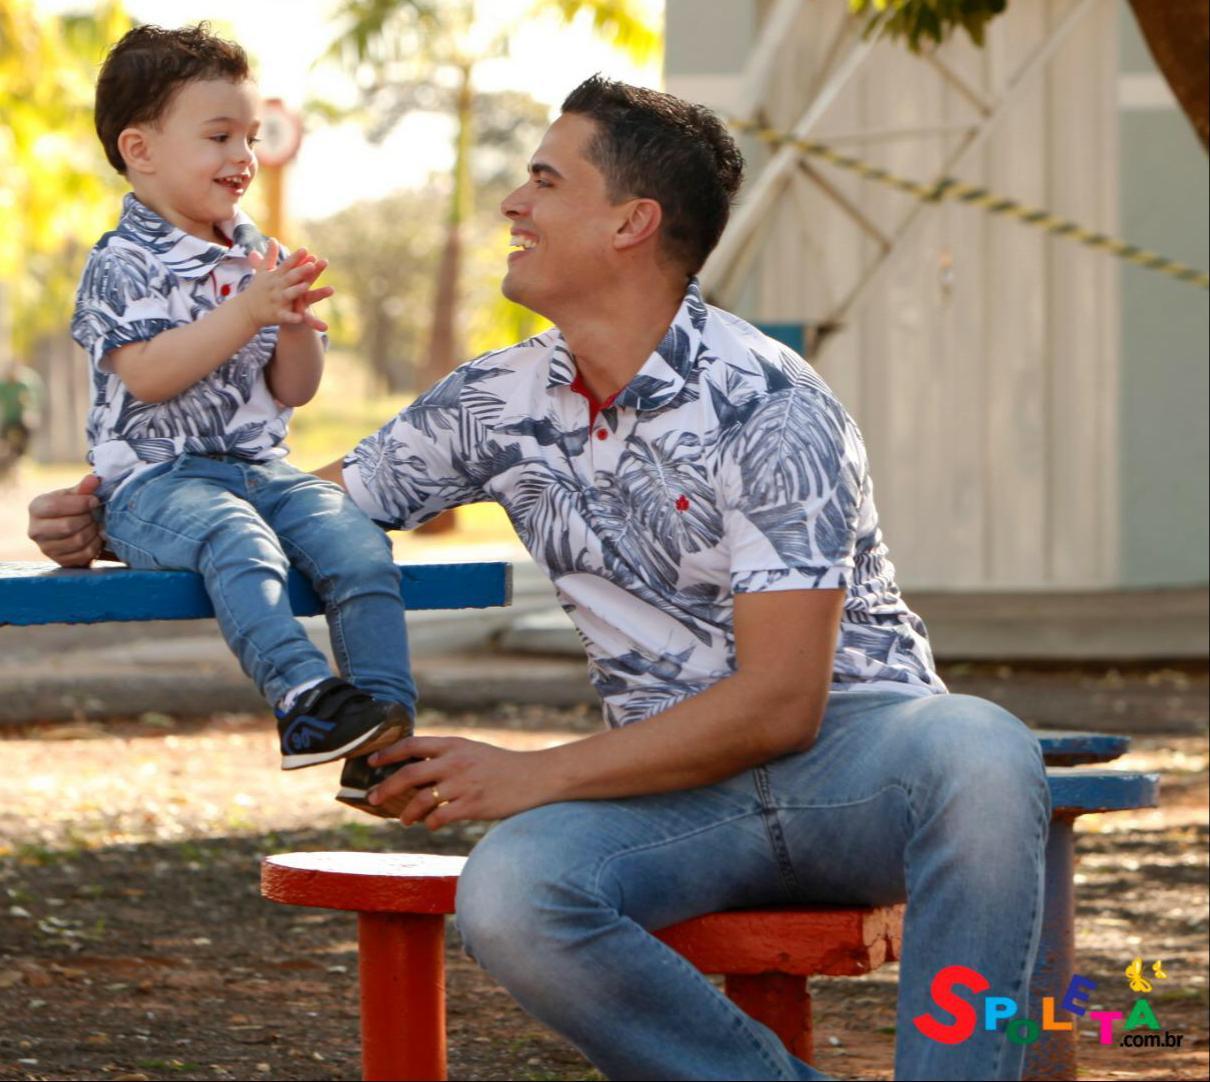 Camisa polo folhagens Pai